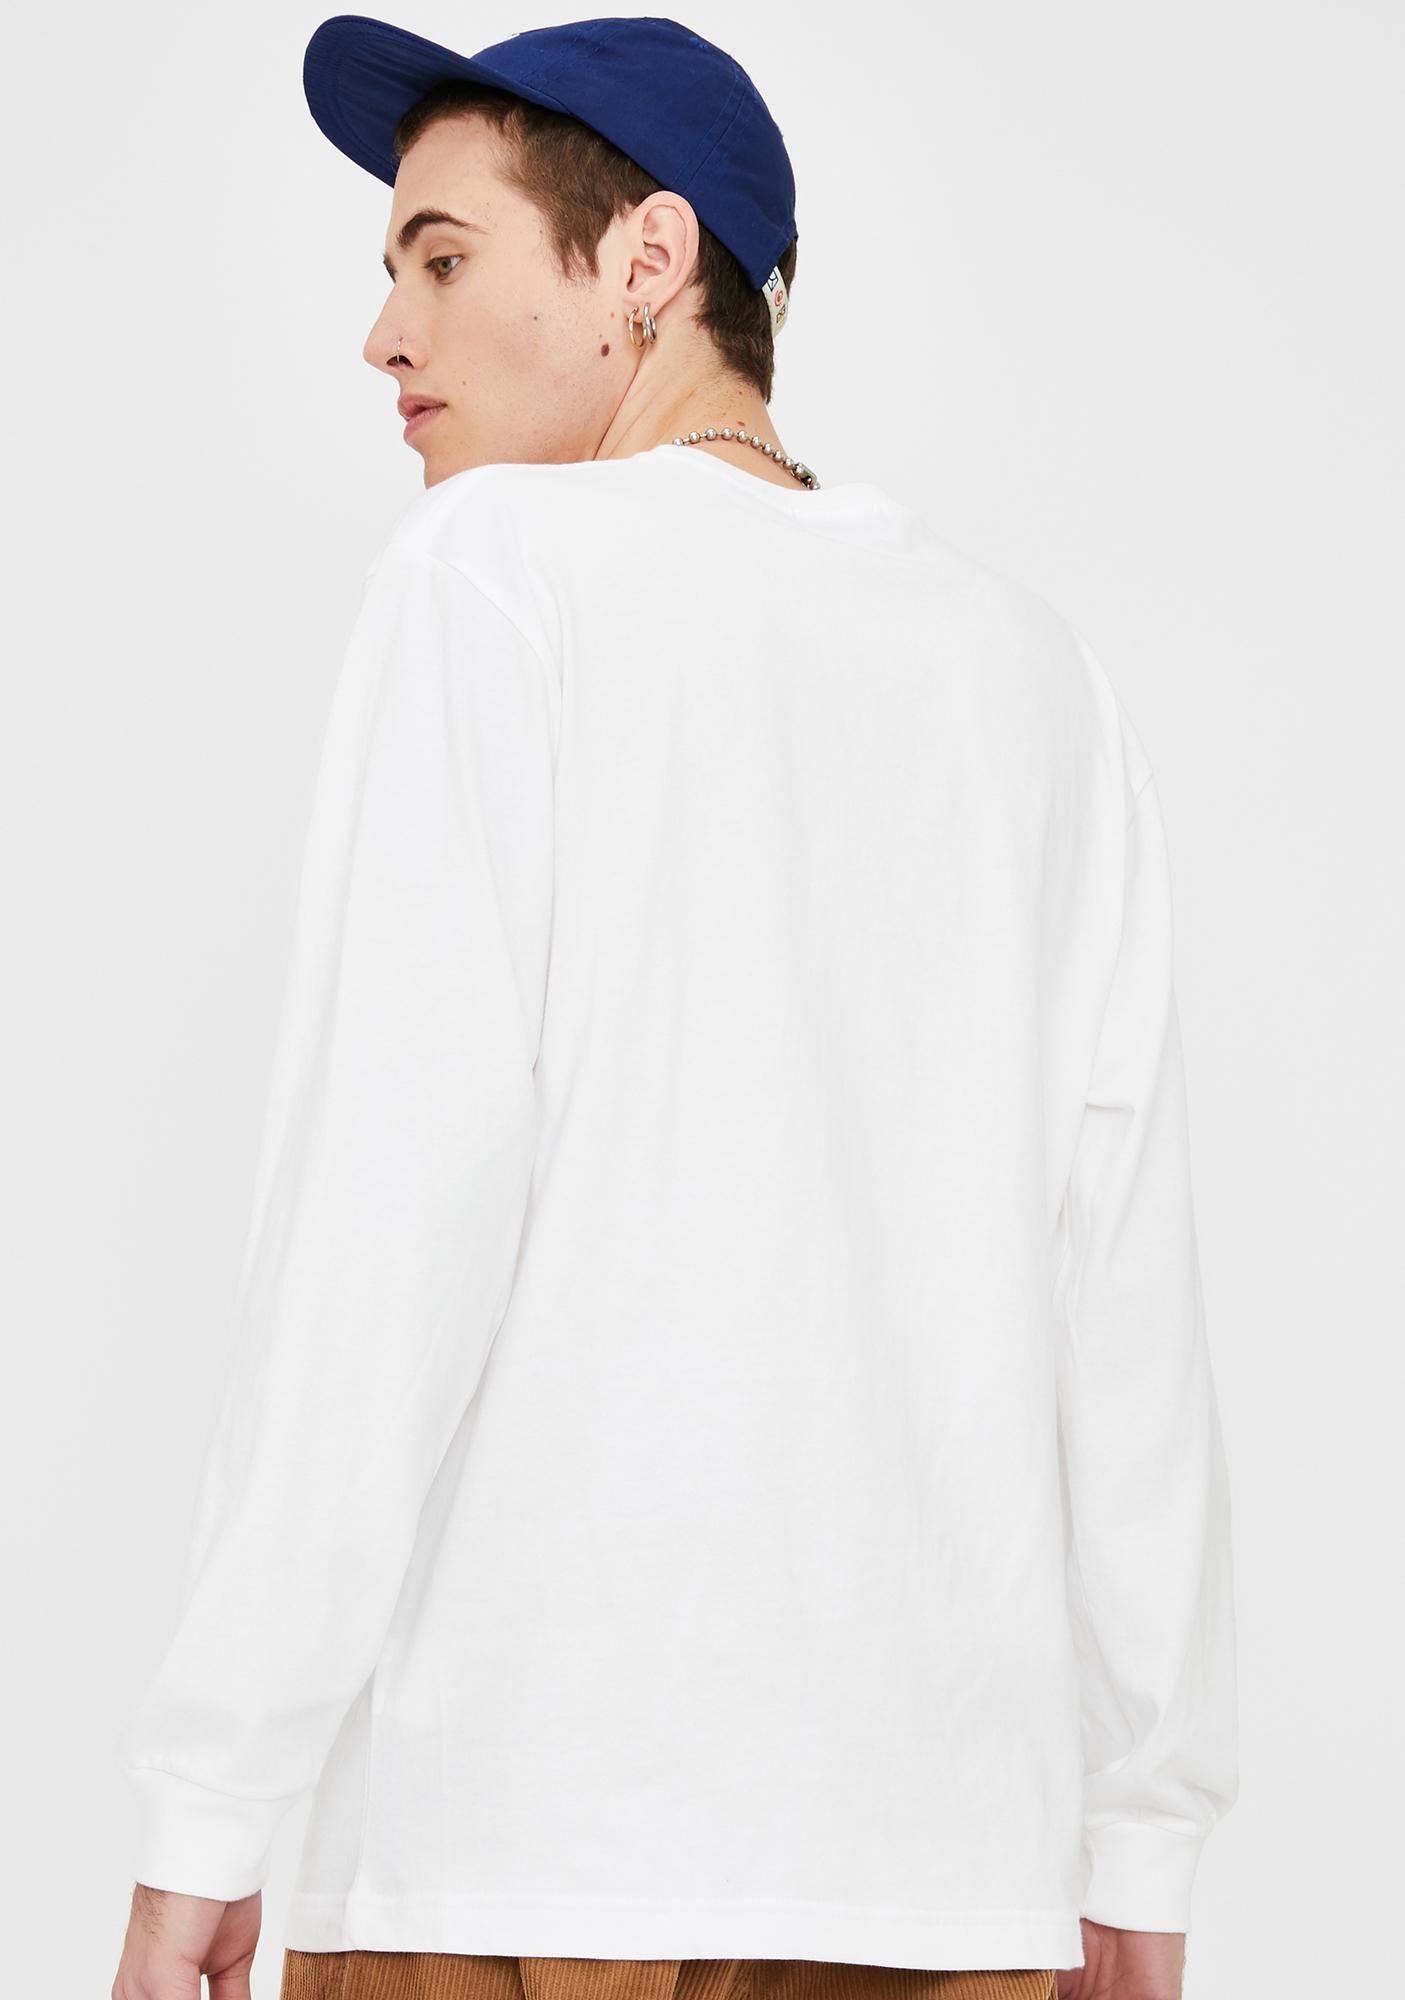 XLARGE White Flower Long Sleeve Graphic Tee